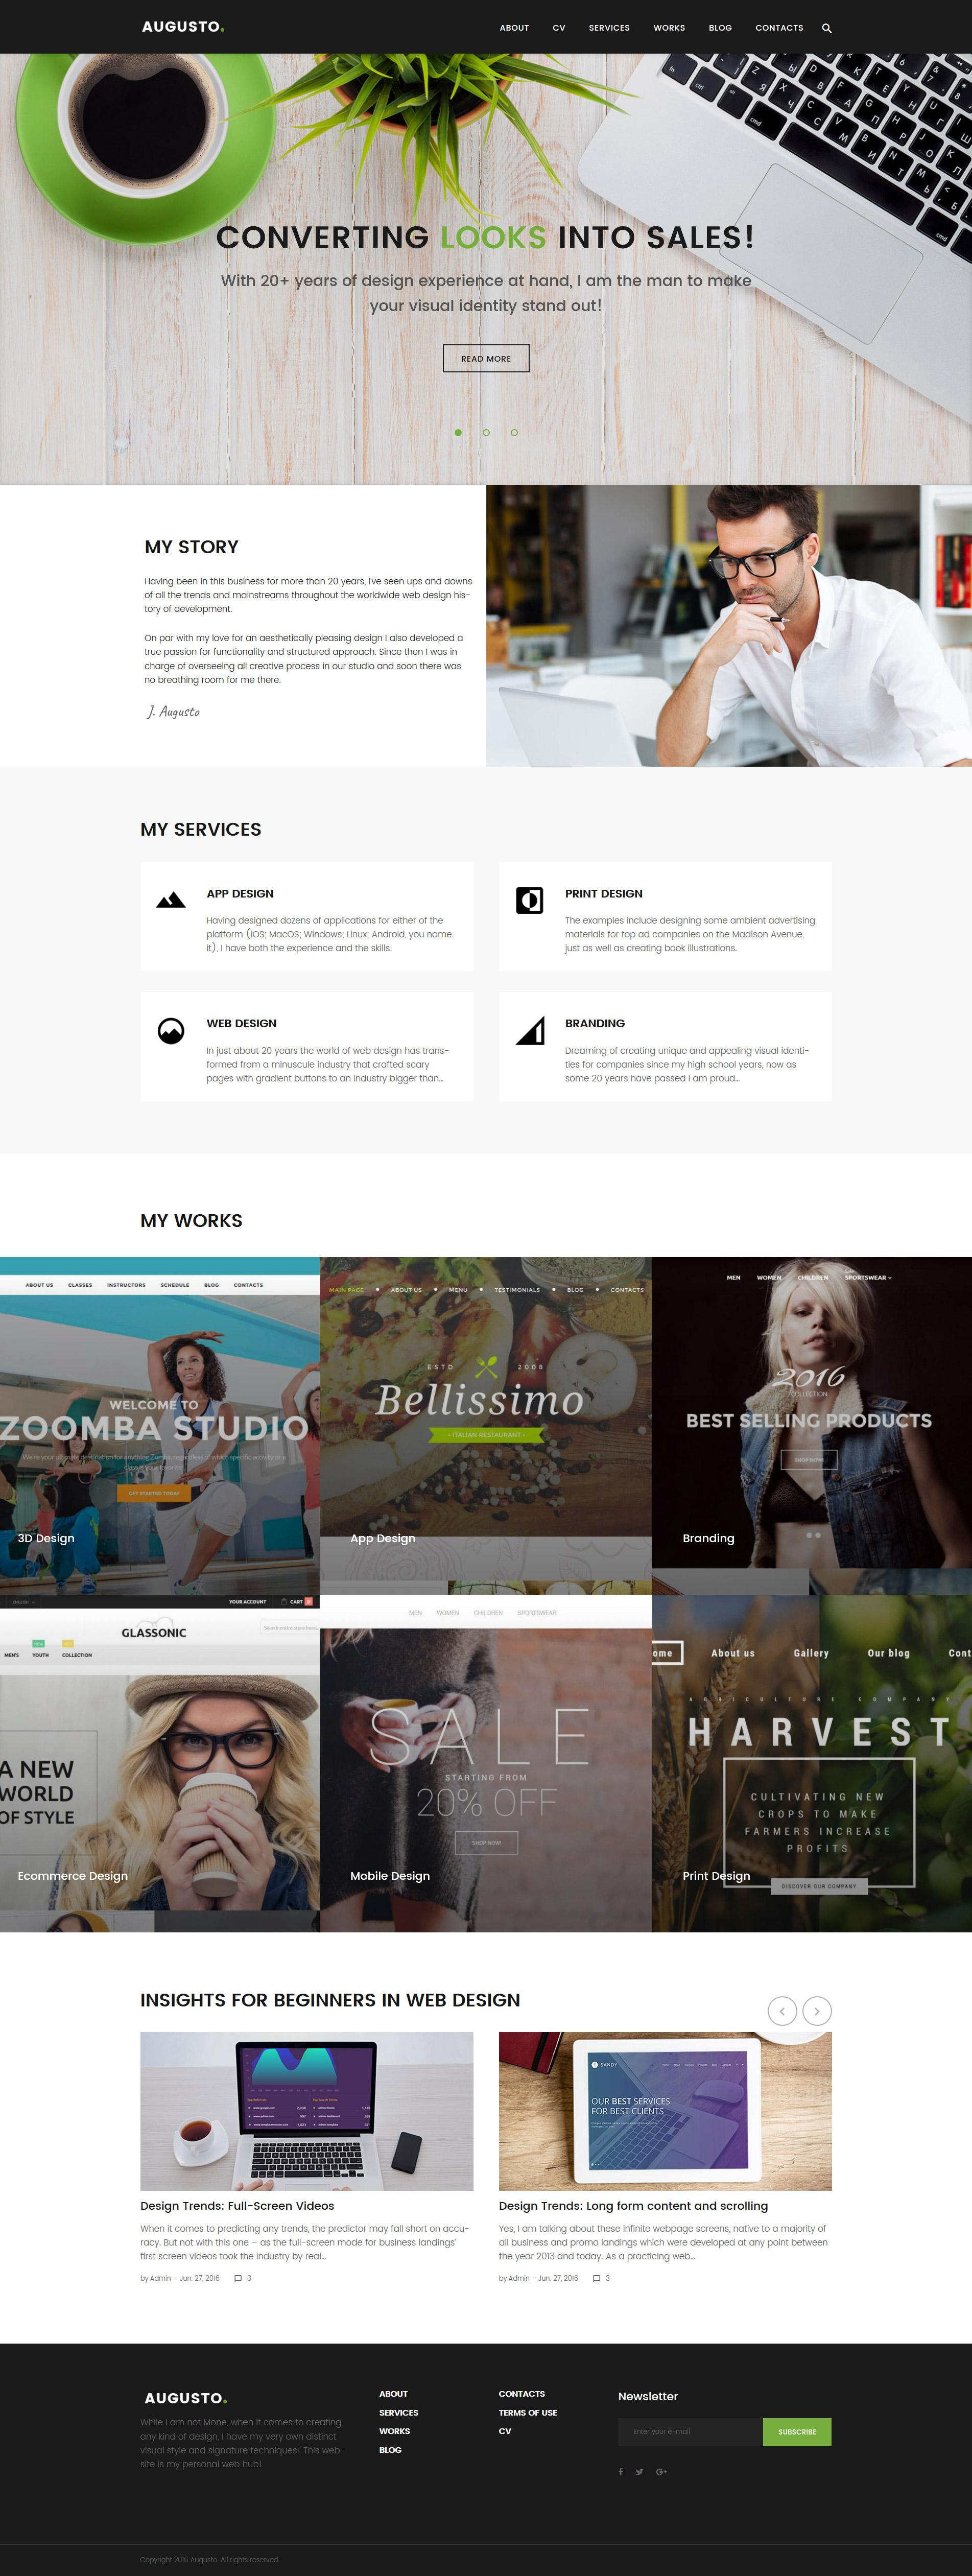 Augusto - Freelance Designer & Web Design WordPress Theme - screenshot